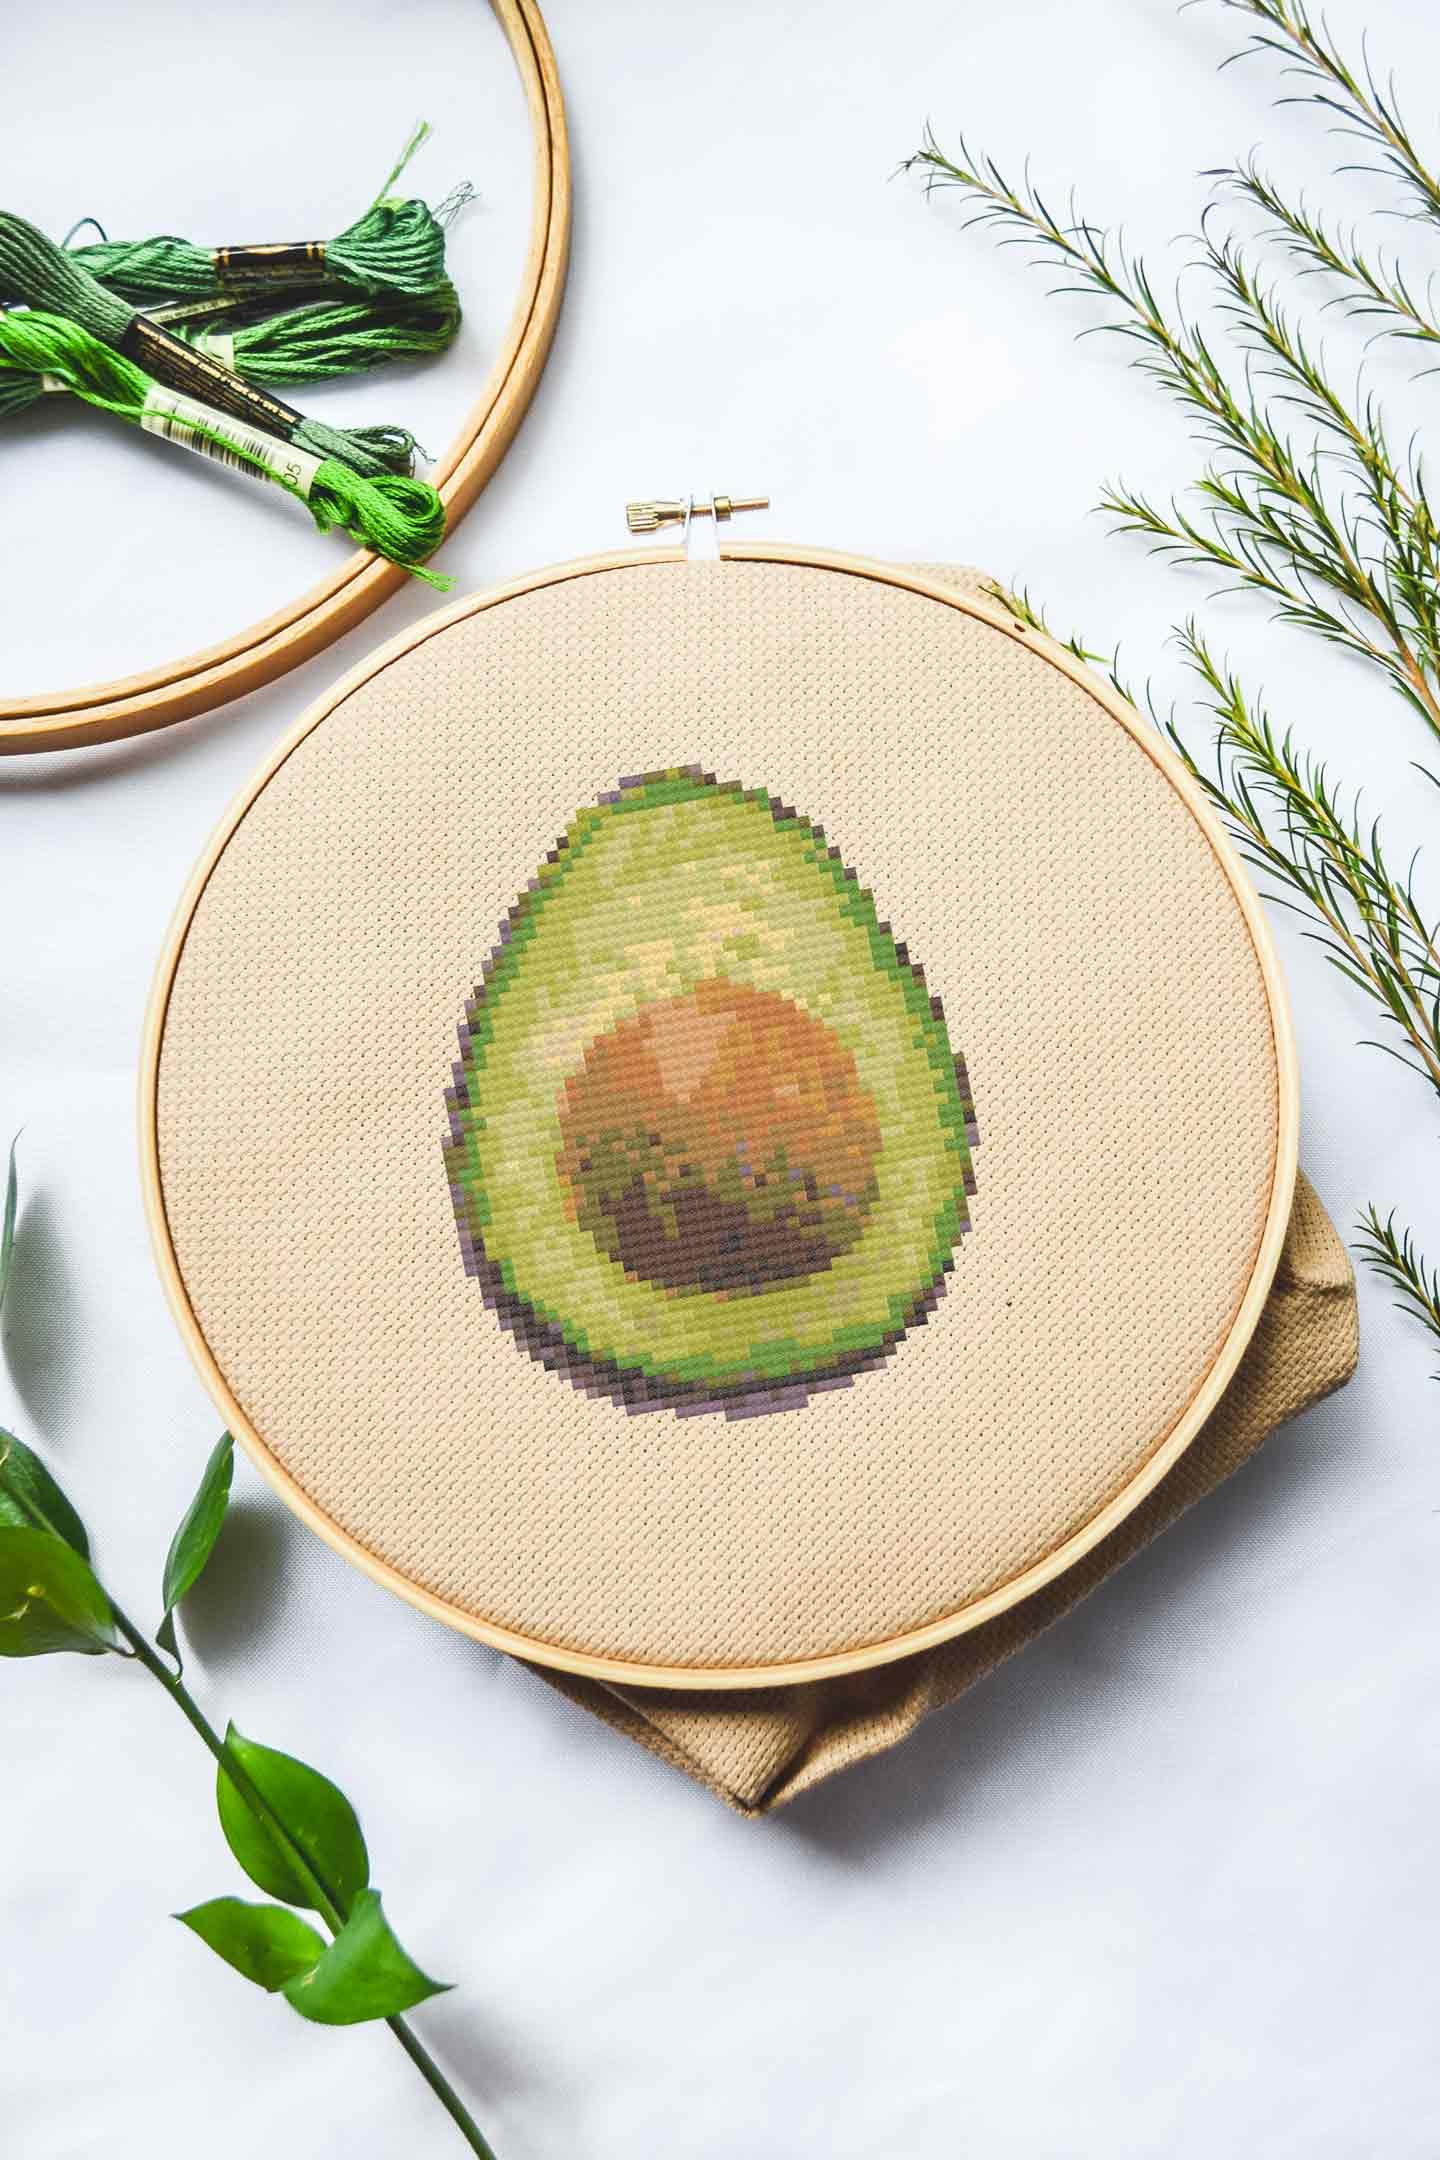 avocado cross stitch pattern